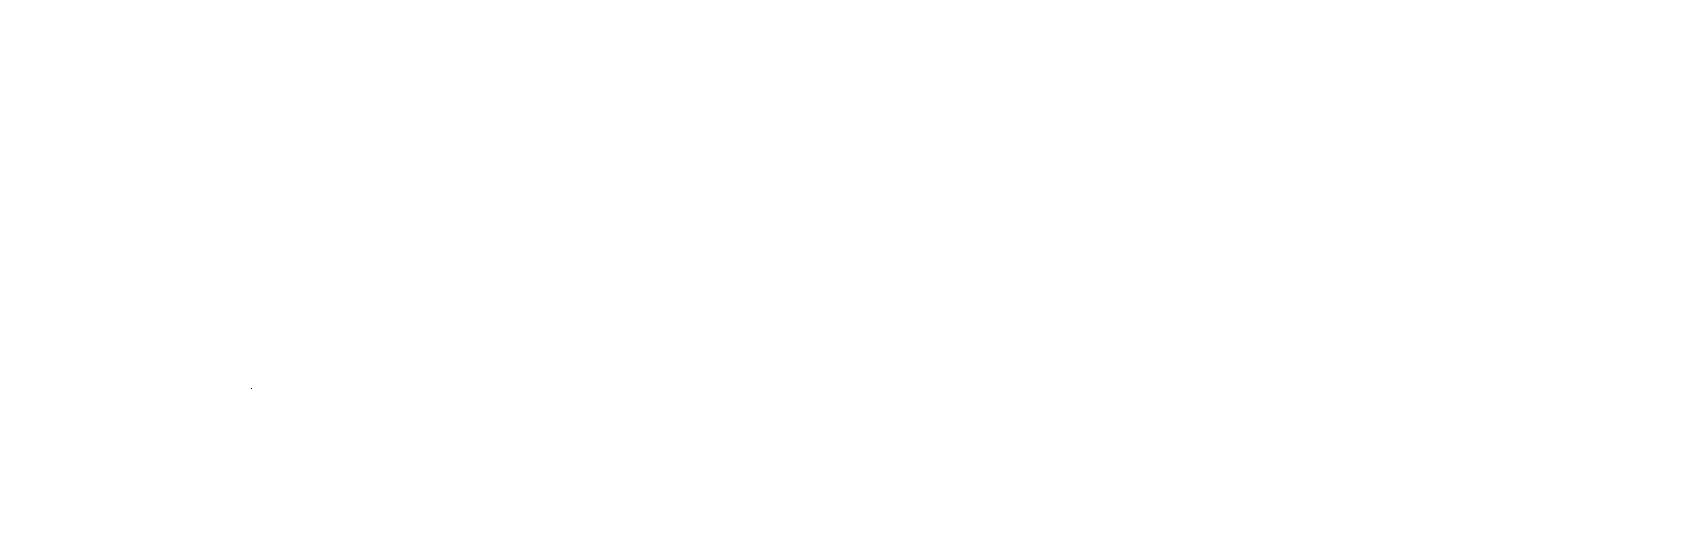 https://secureservercdn.net/192.169.223.13/p7b.f84.myftpupload.com/wp-content/uploads/2021/04/Original-Logo-copy.png